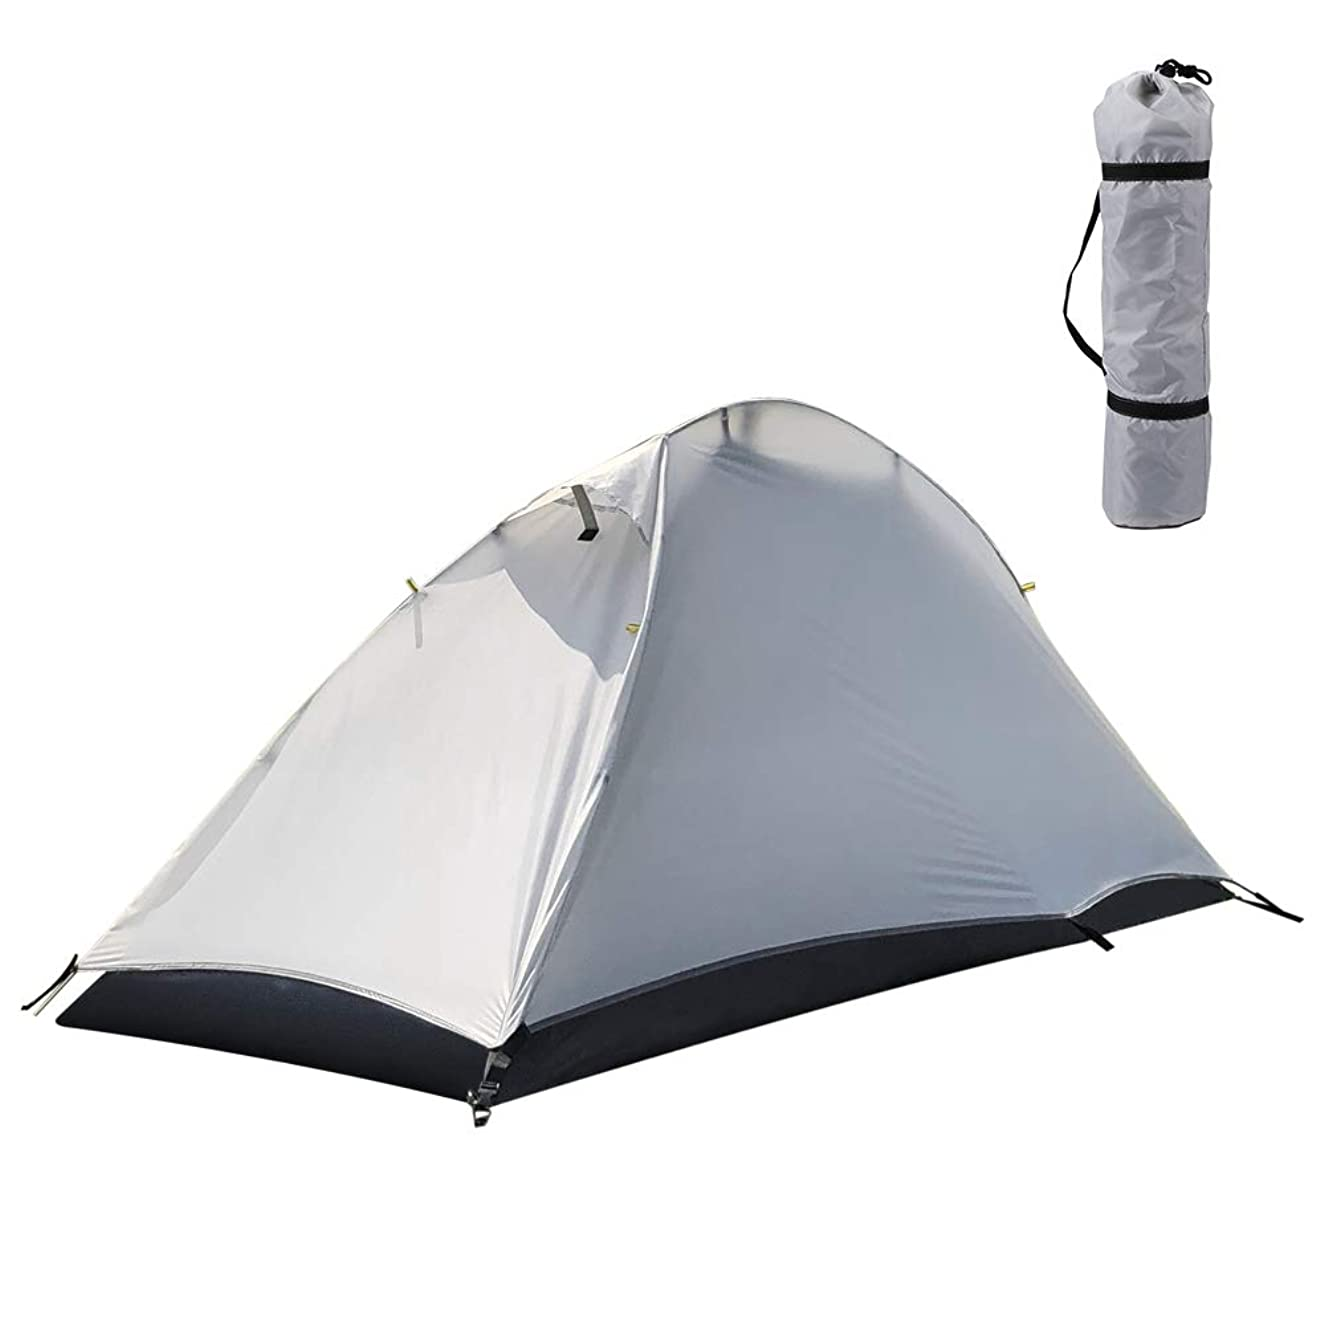 Walmeck- Free-Standing Camping Tent Hiking Climbing Sleeping Tent Sunlight Shelter Detachable Single Camping Cabana Waterproof Outdoor Sleeping Tent